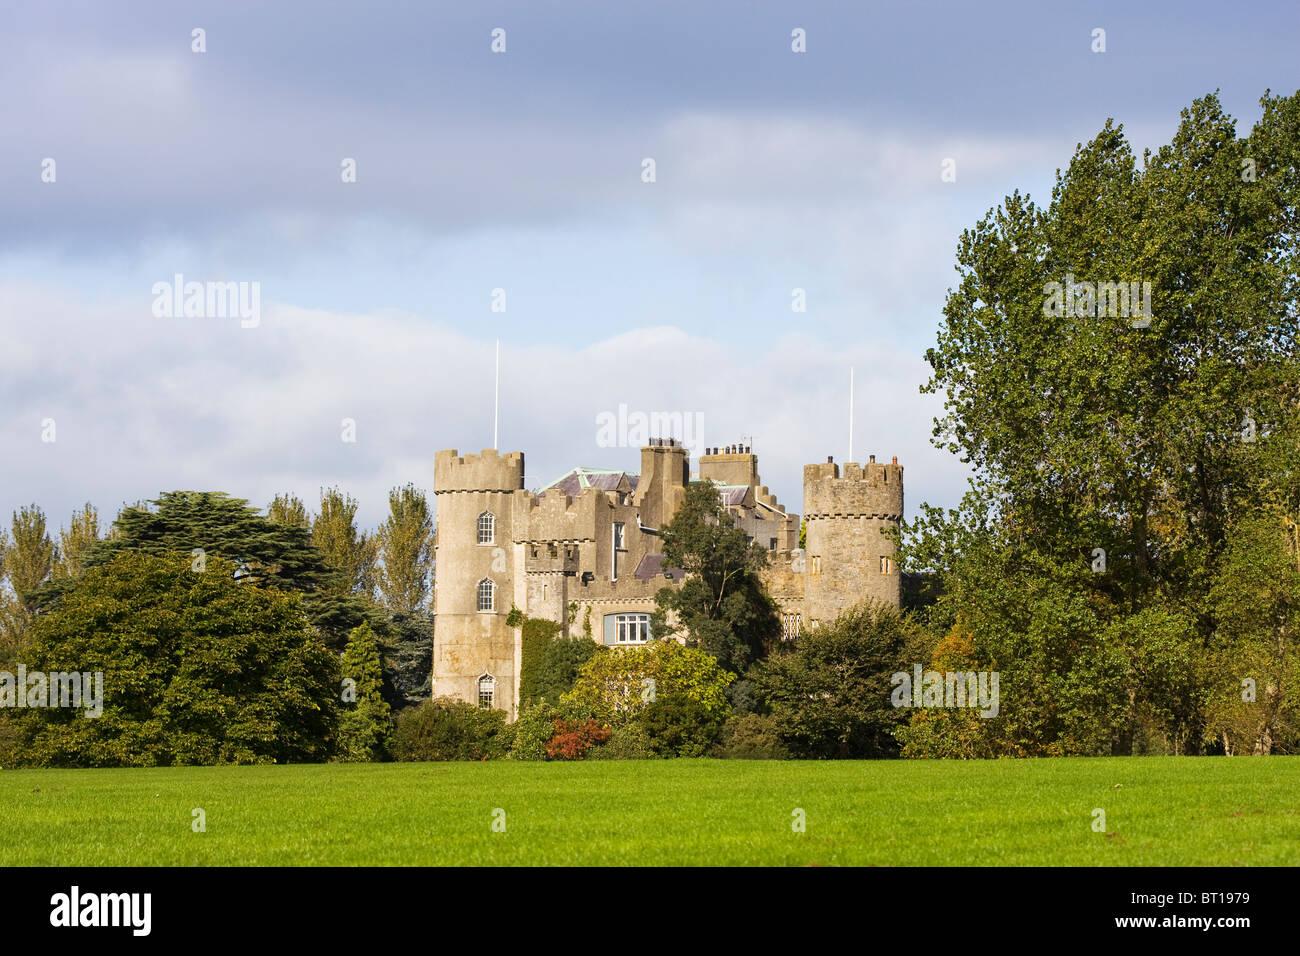 Malahide Castle in Dublin, Ireland. - Stock Image